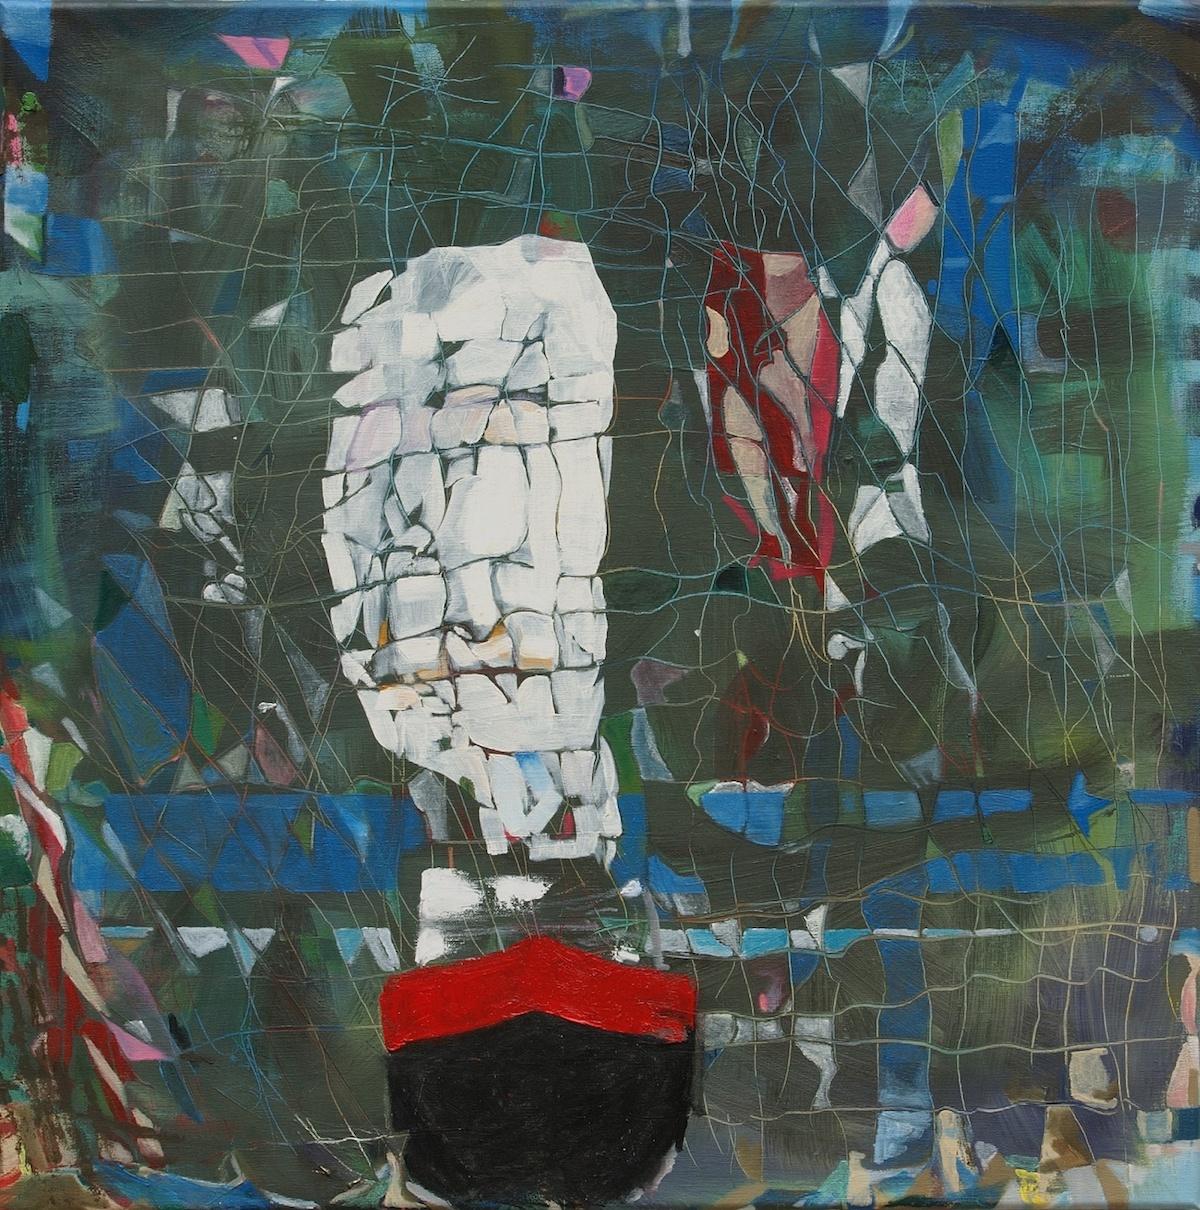 Title: The Ghetty docked Medium: Oil Size: 75 x 75 x 2 cm